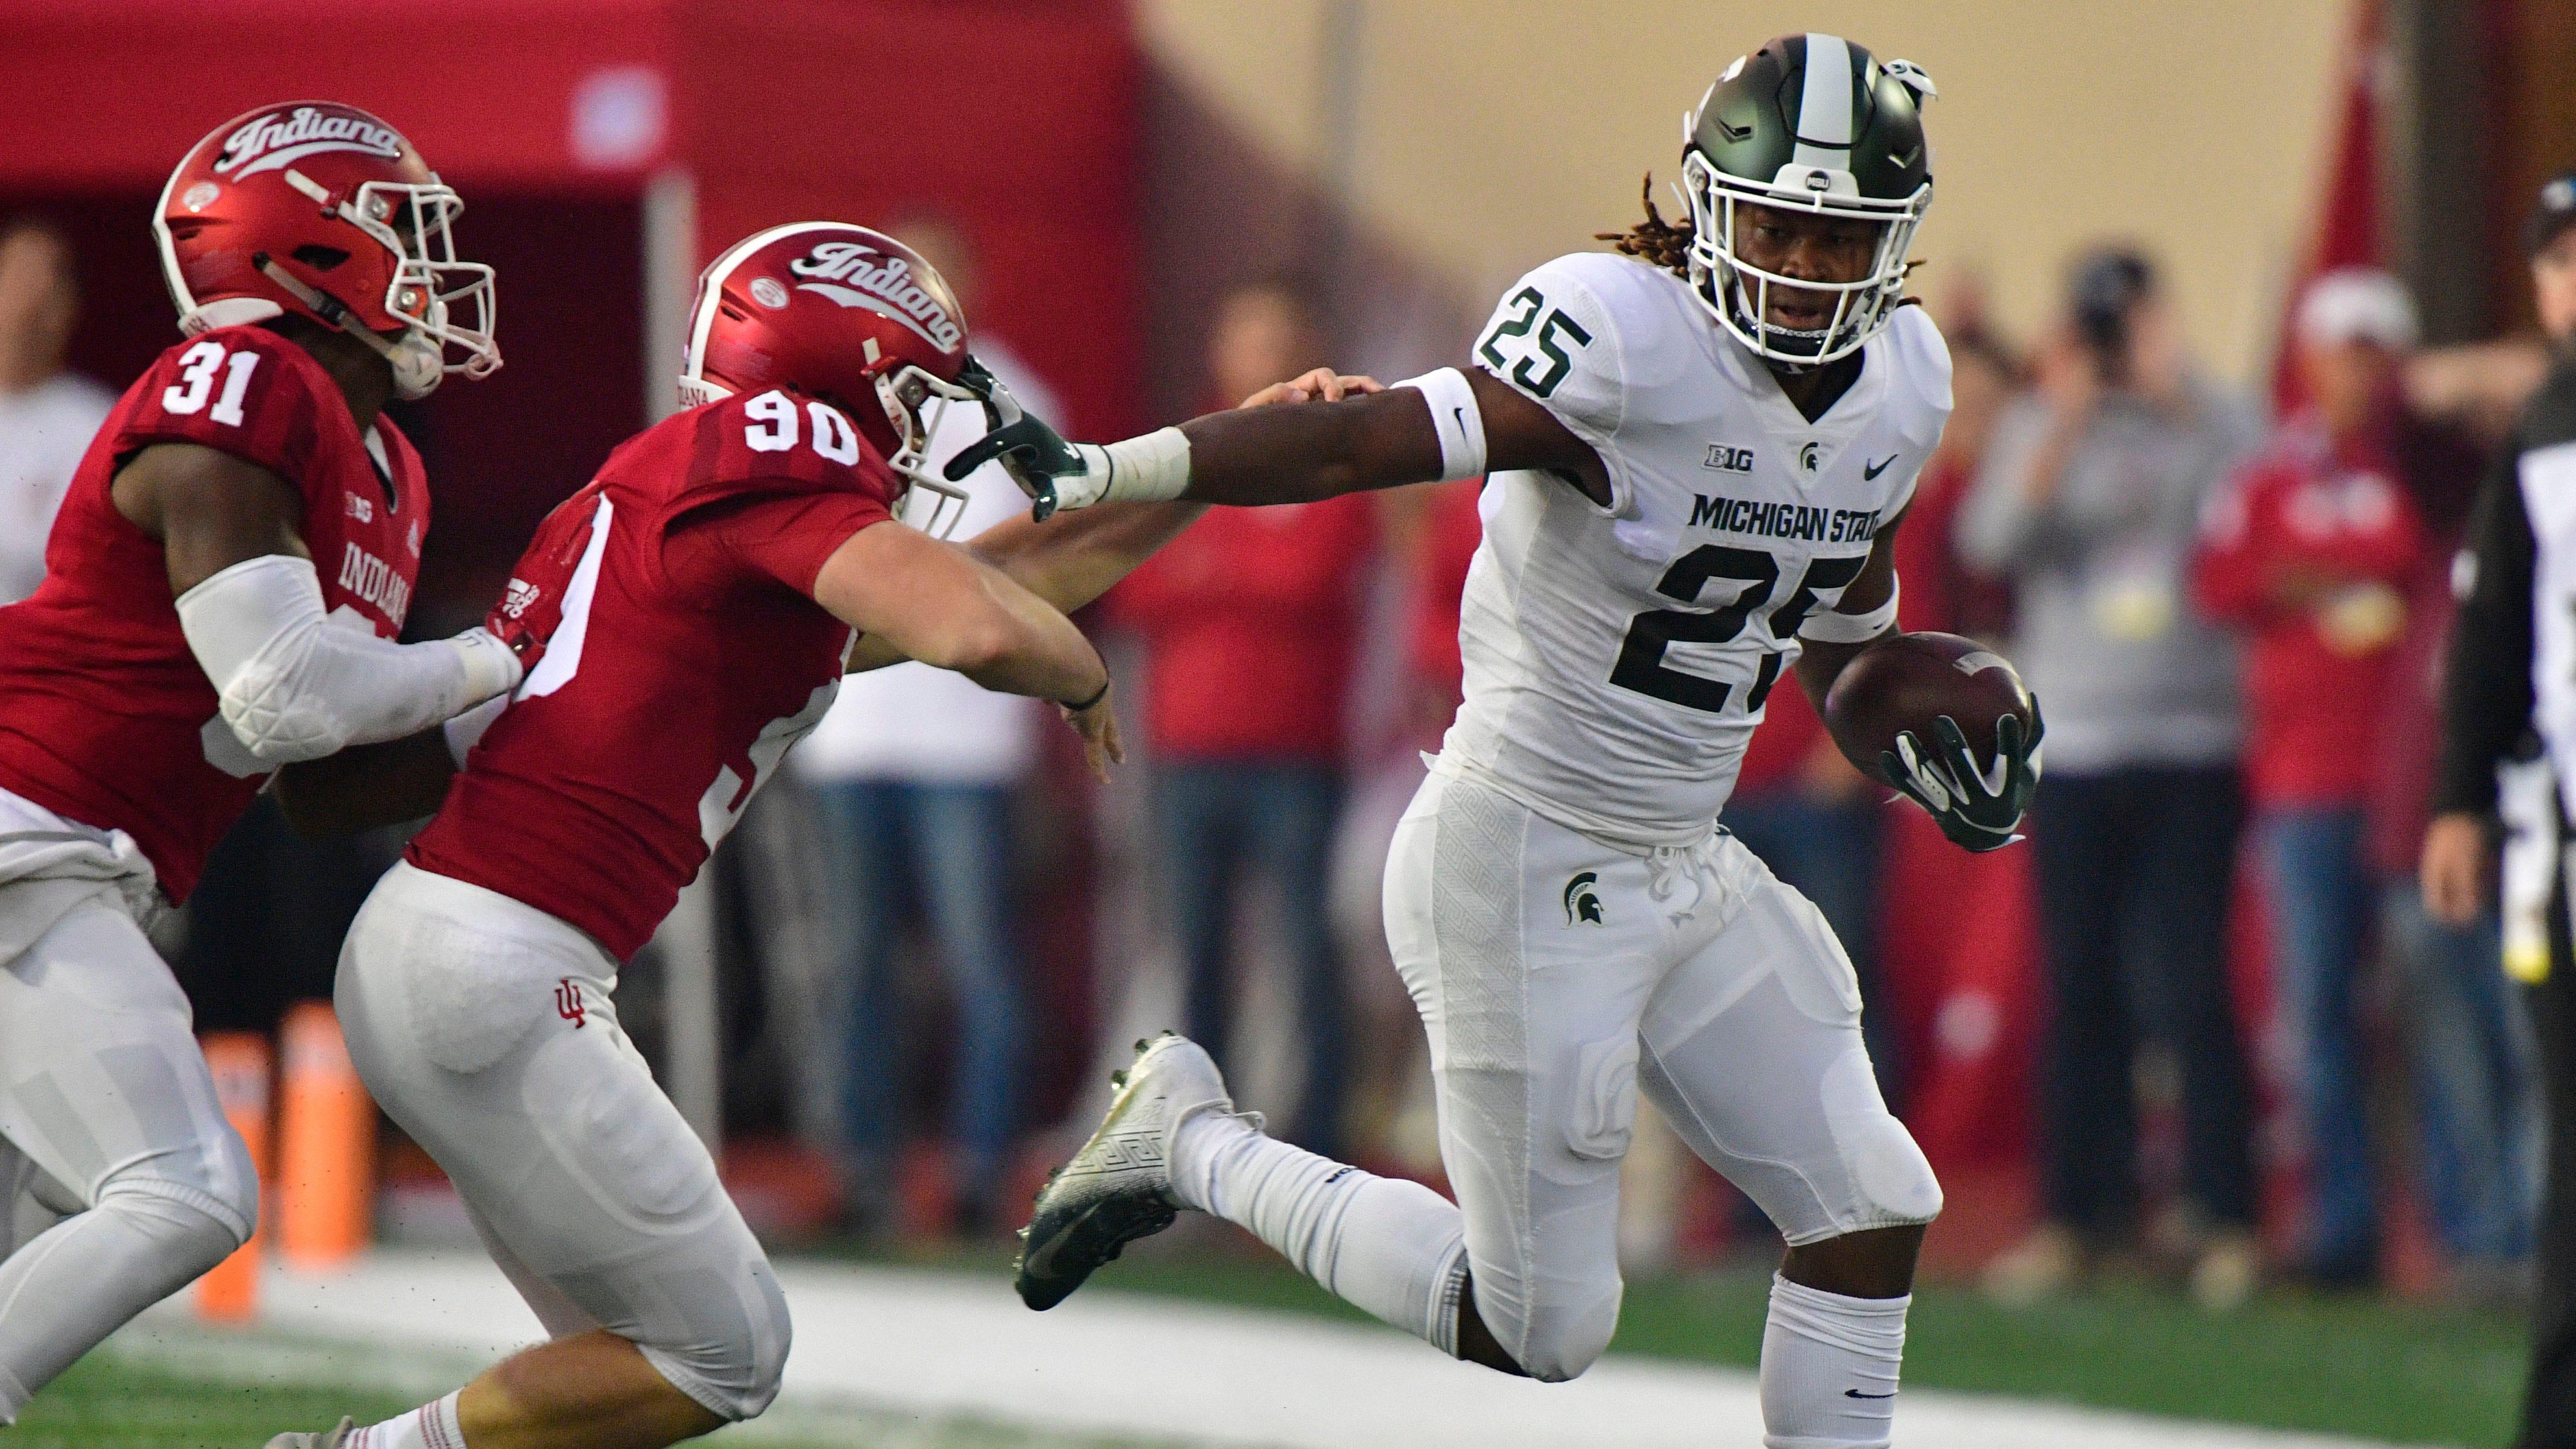 Replay: Michigan State football 35, Indiana 21